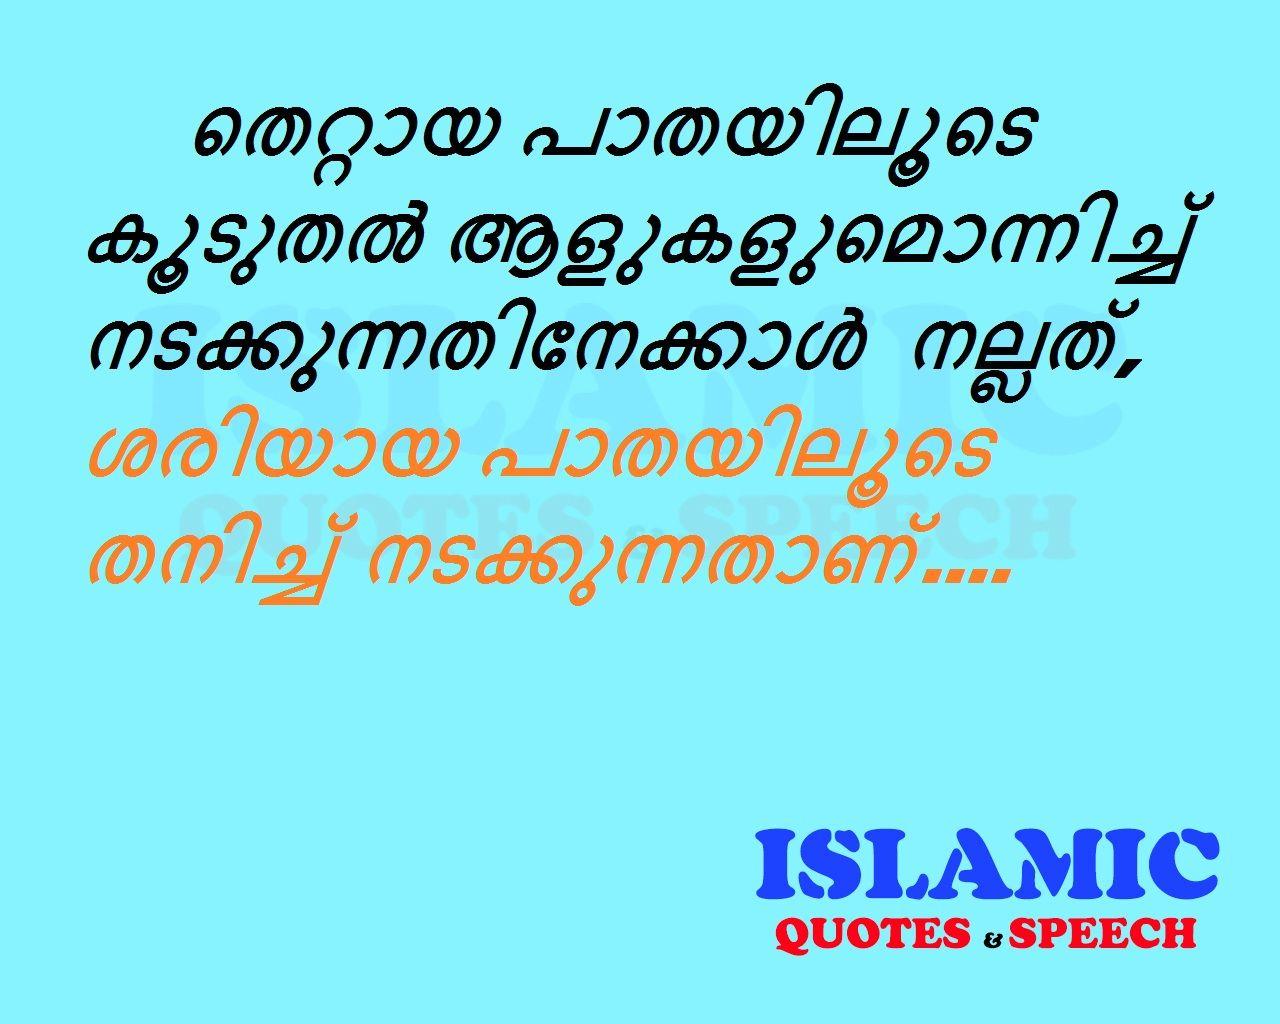 Httpsfacebookislamic quotes speech 223638031346 httpsfacebookislamic quotes speech kristyandbryce Choice Image